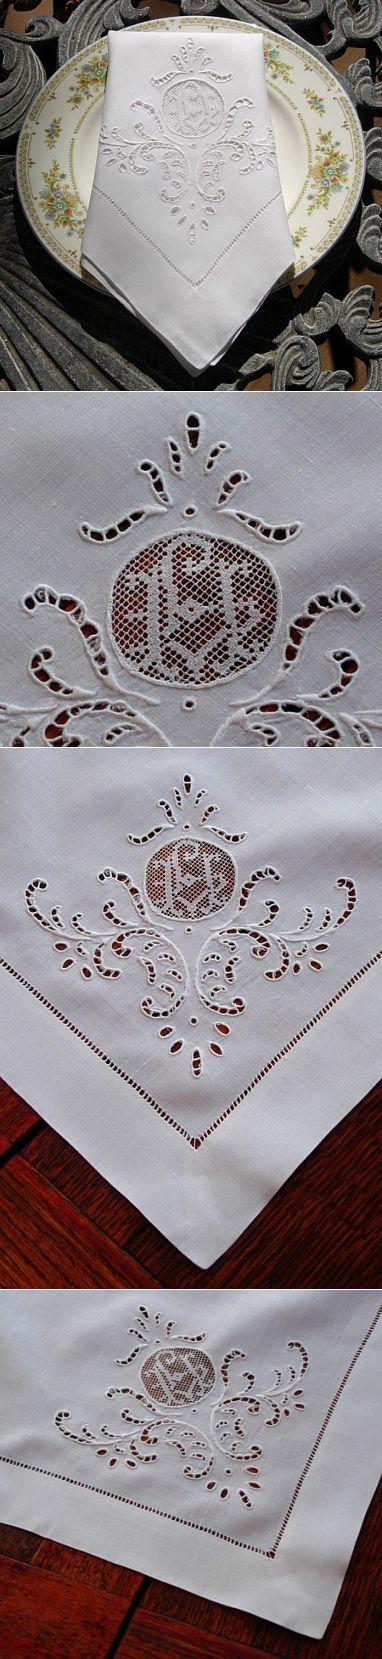 Em's Heart Antique Linens -Italian Antique Linen Embroidered Napkins